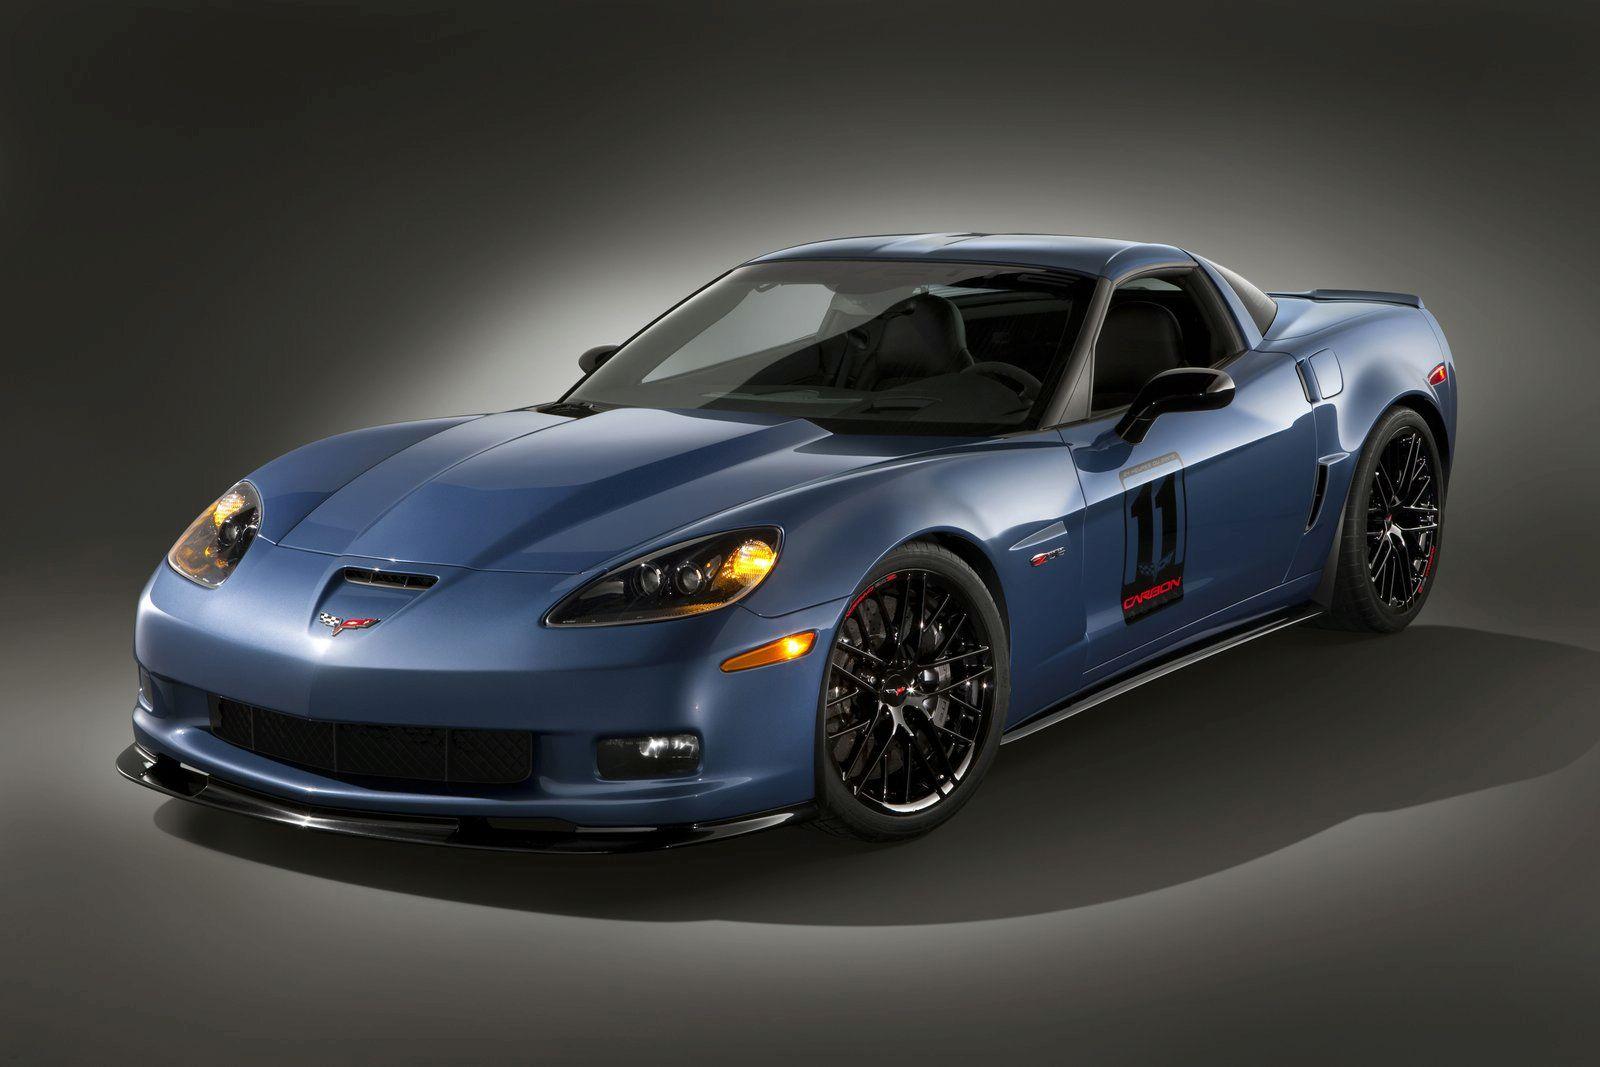 2011-Chevrolet-Corvette-Z06-Carbon-Limited-Edition-Front-Angle-View-1-1-